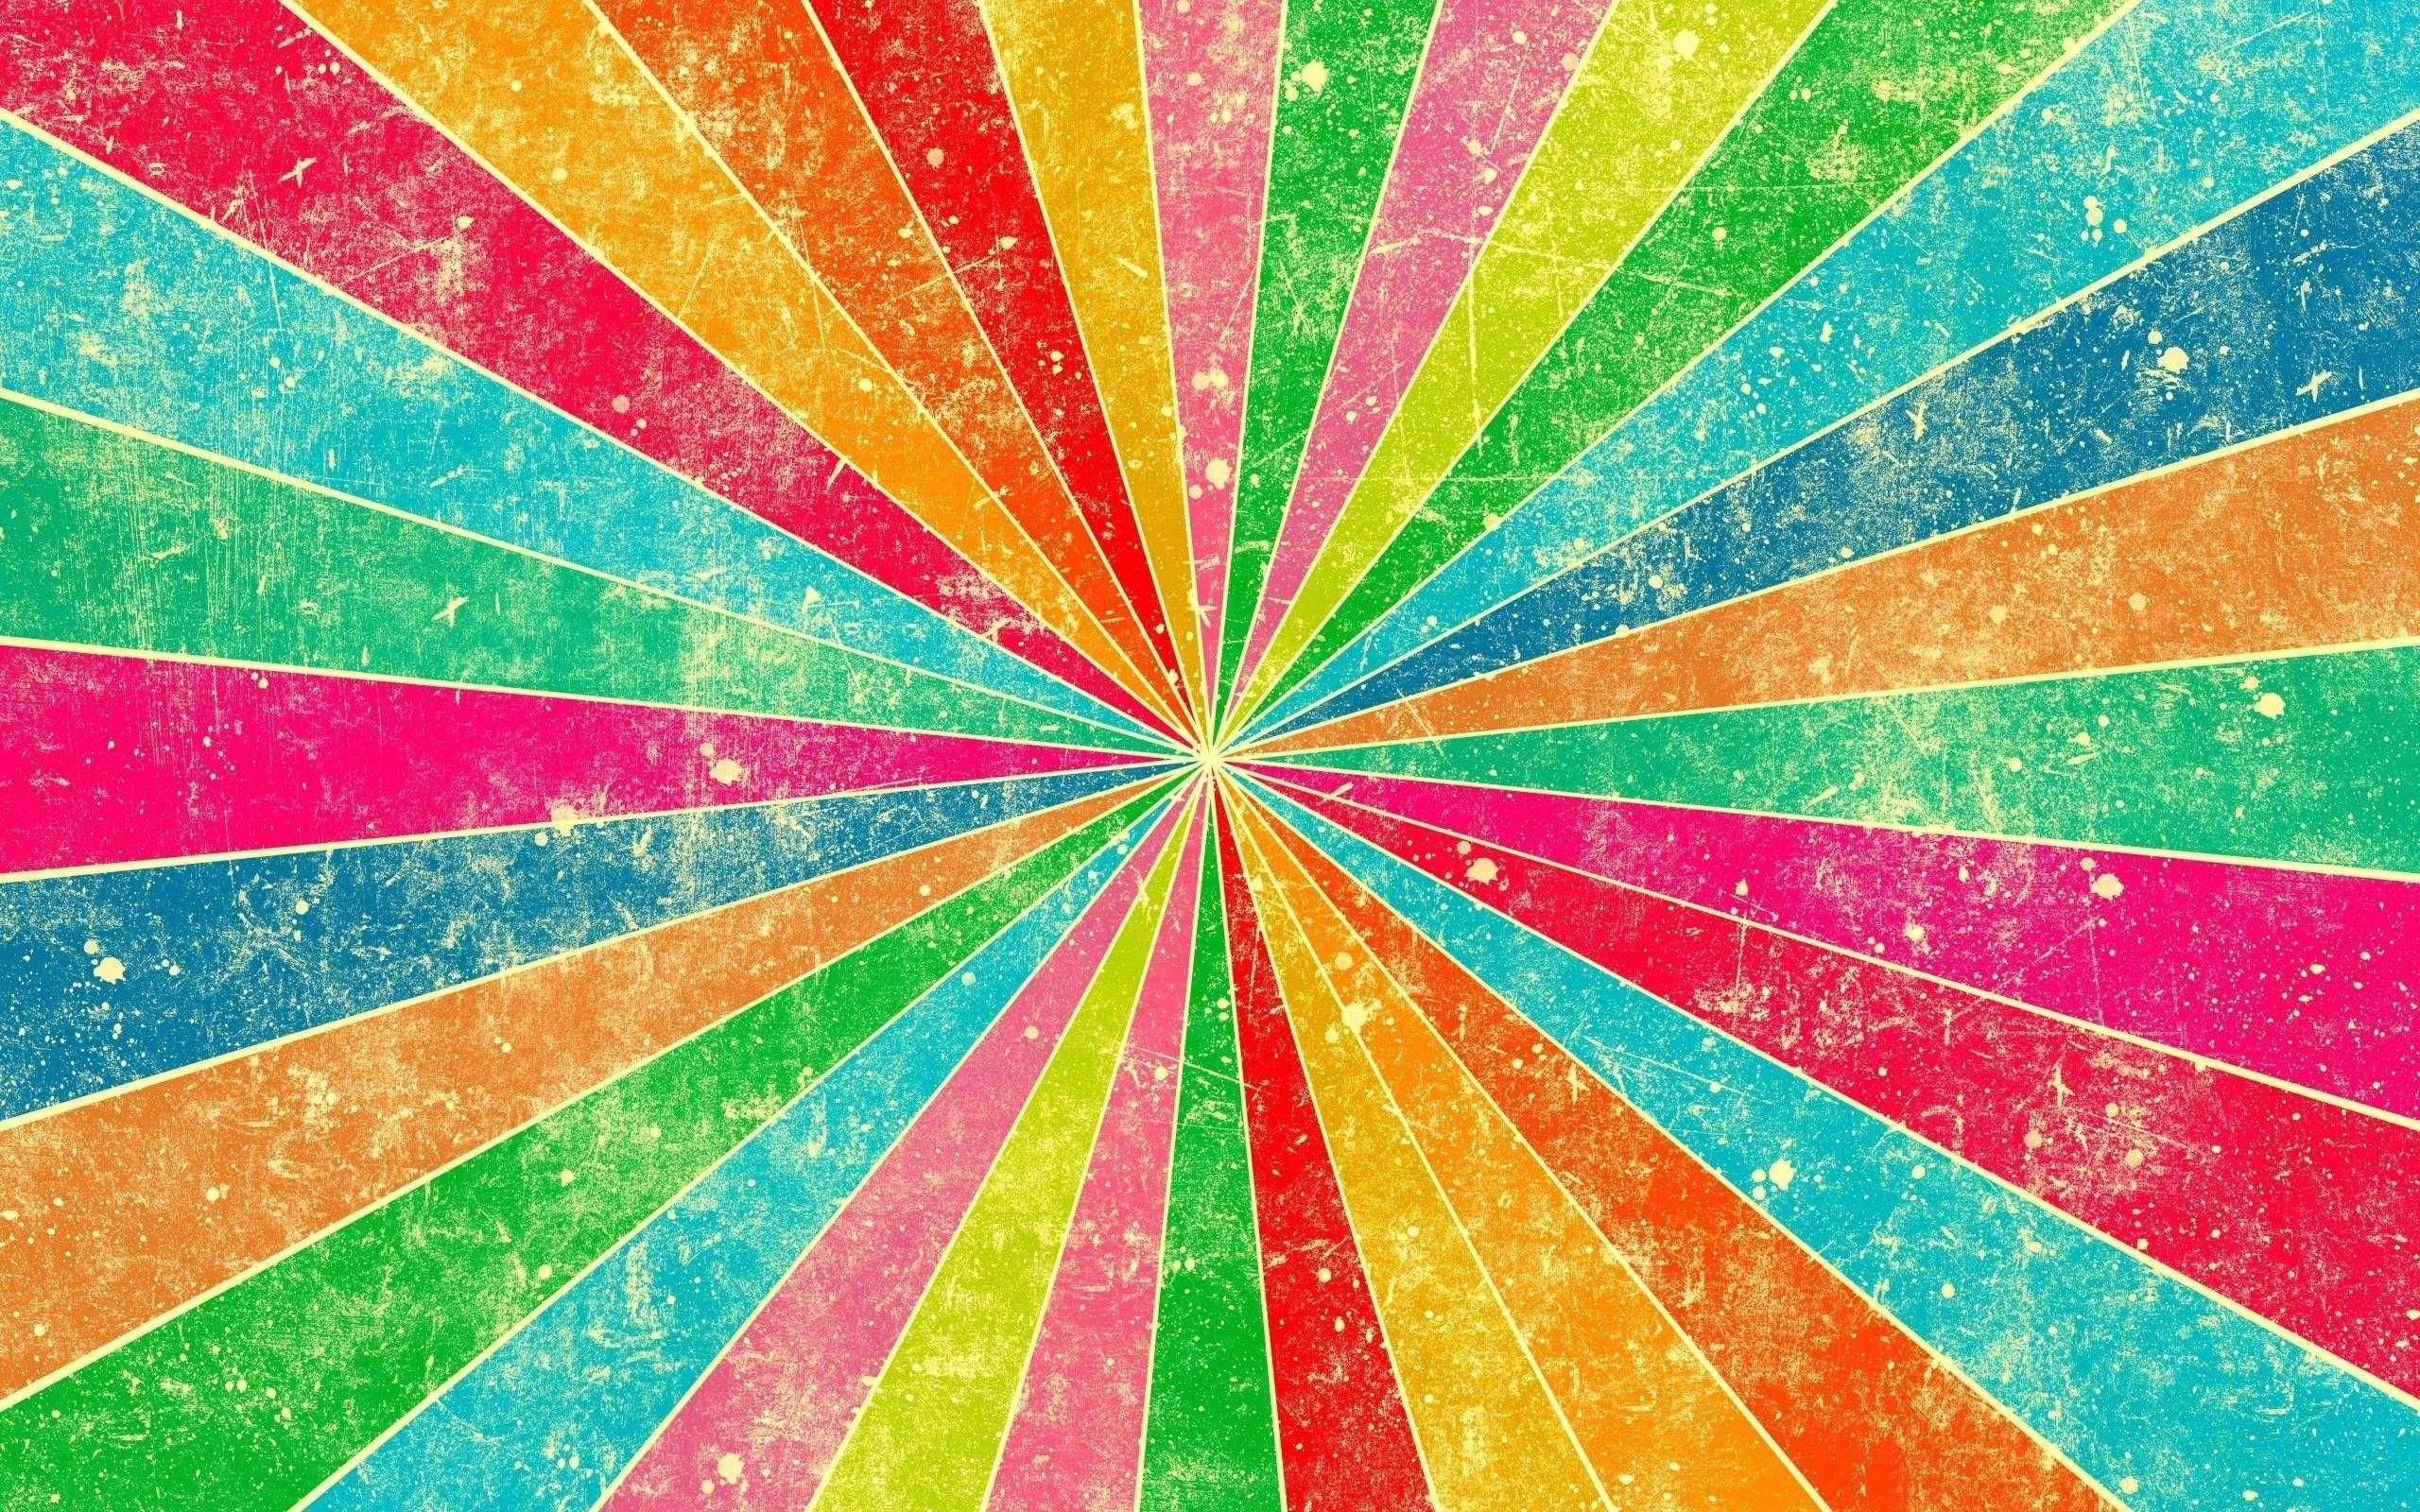 regenbogen muster bunte linien - photo #4